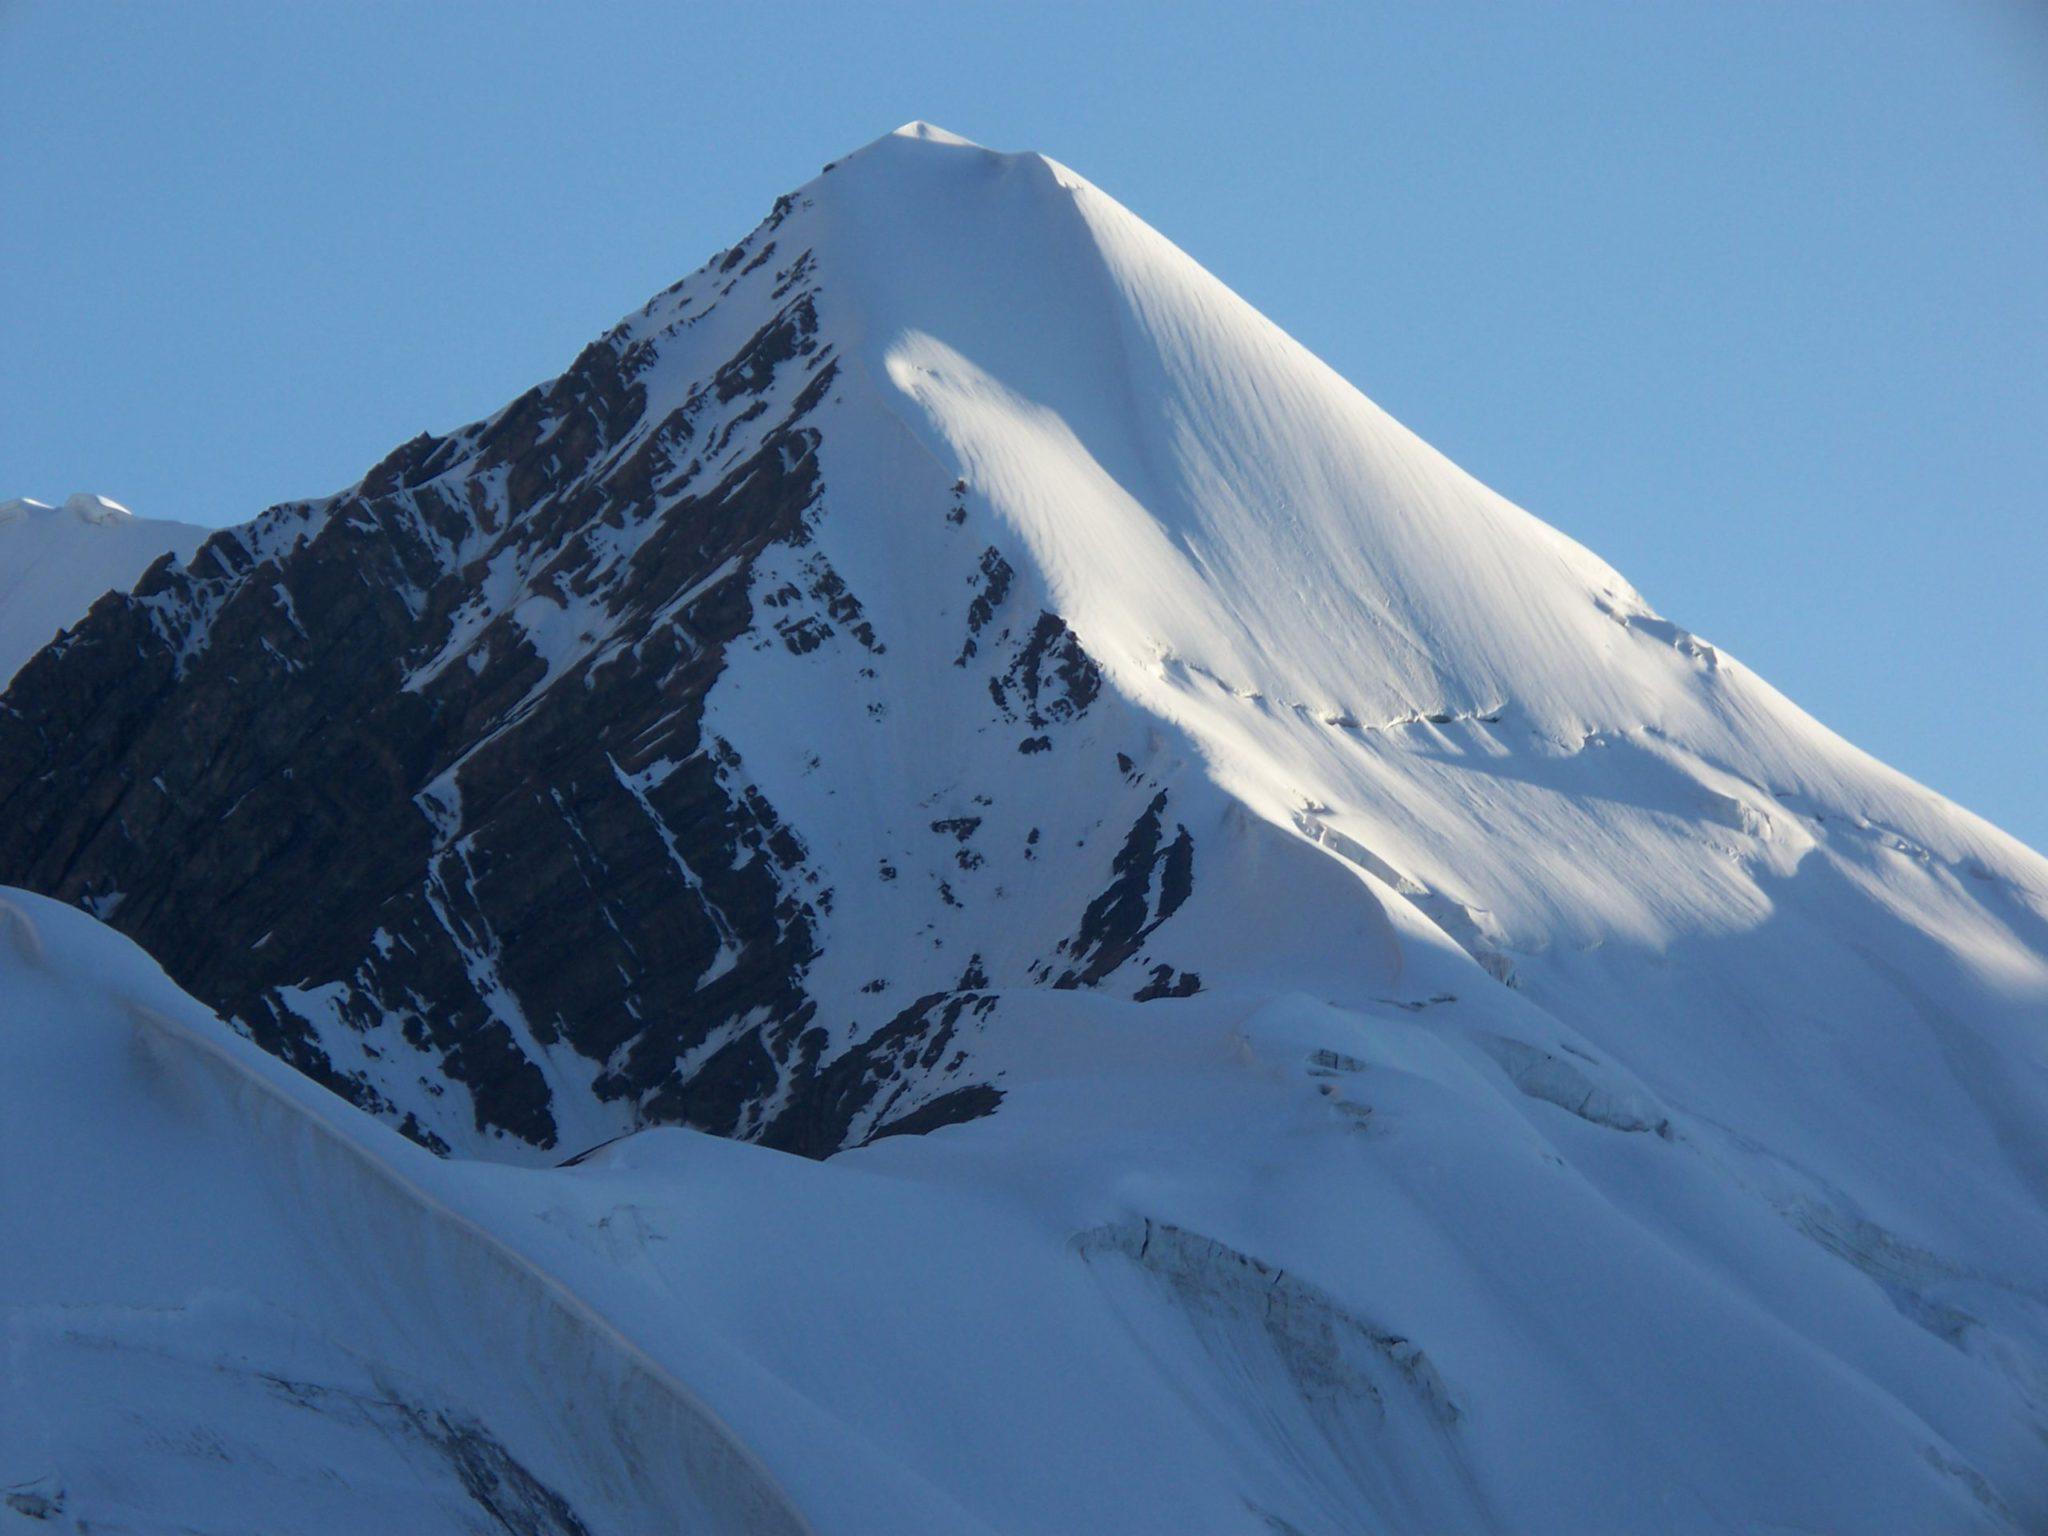 Pamir Mountaineering in Kyrgyzstan: Climb Lenin Peak (7,134m)